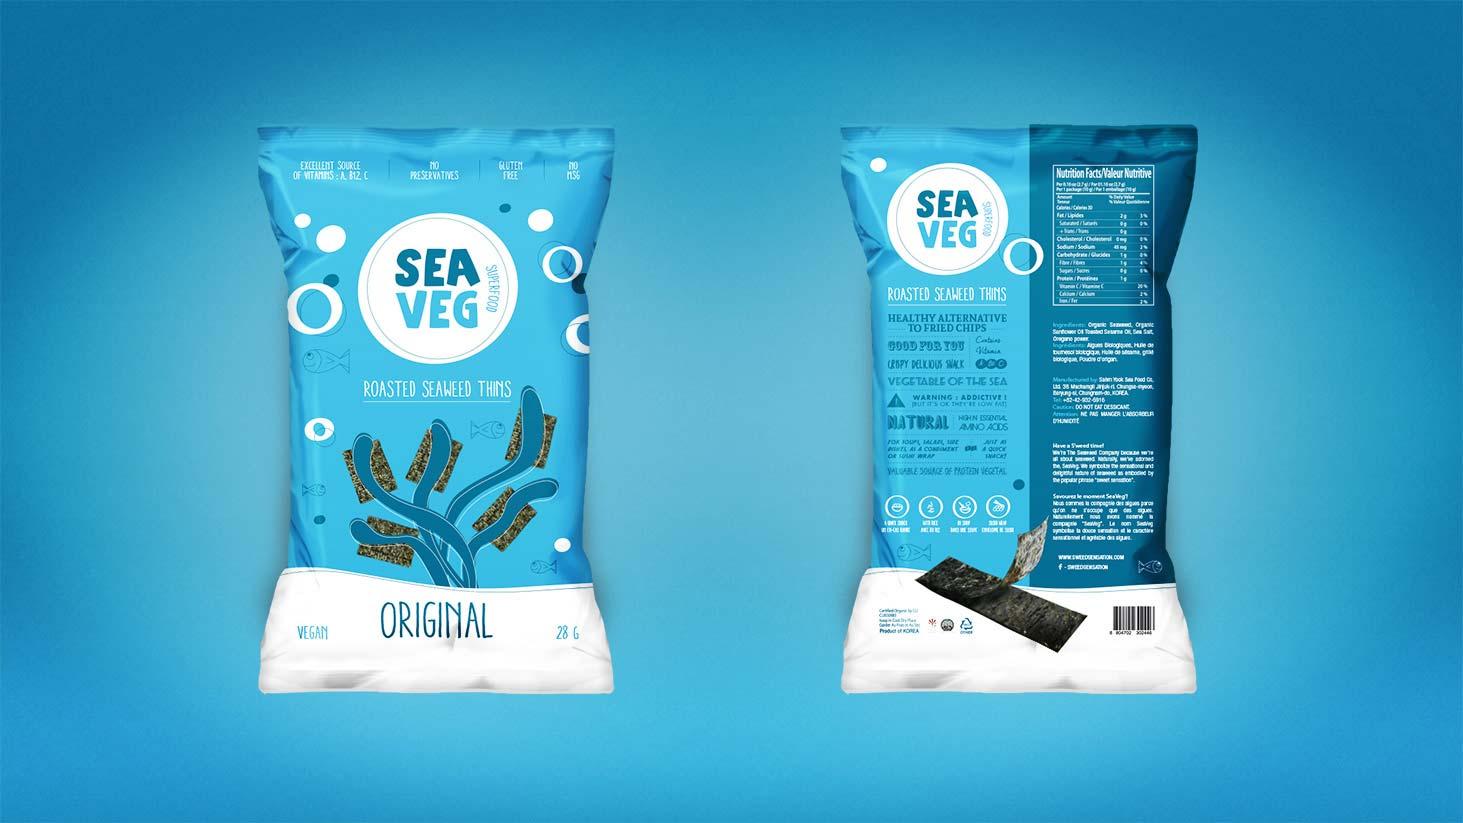 Sea veg